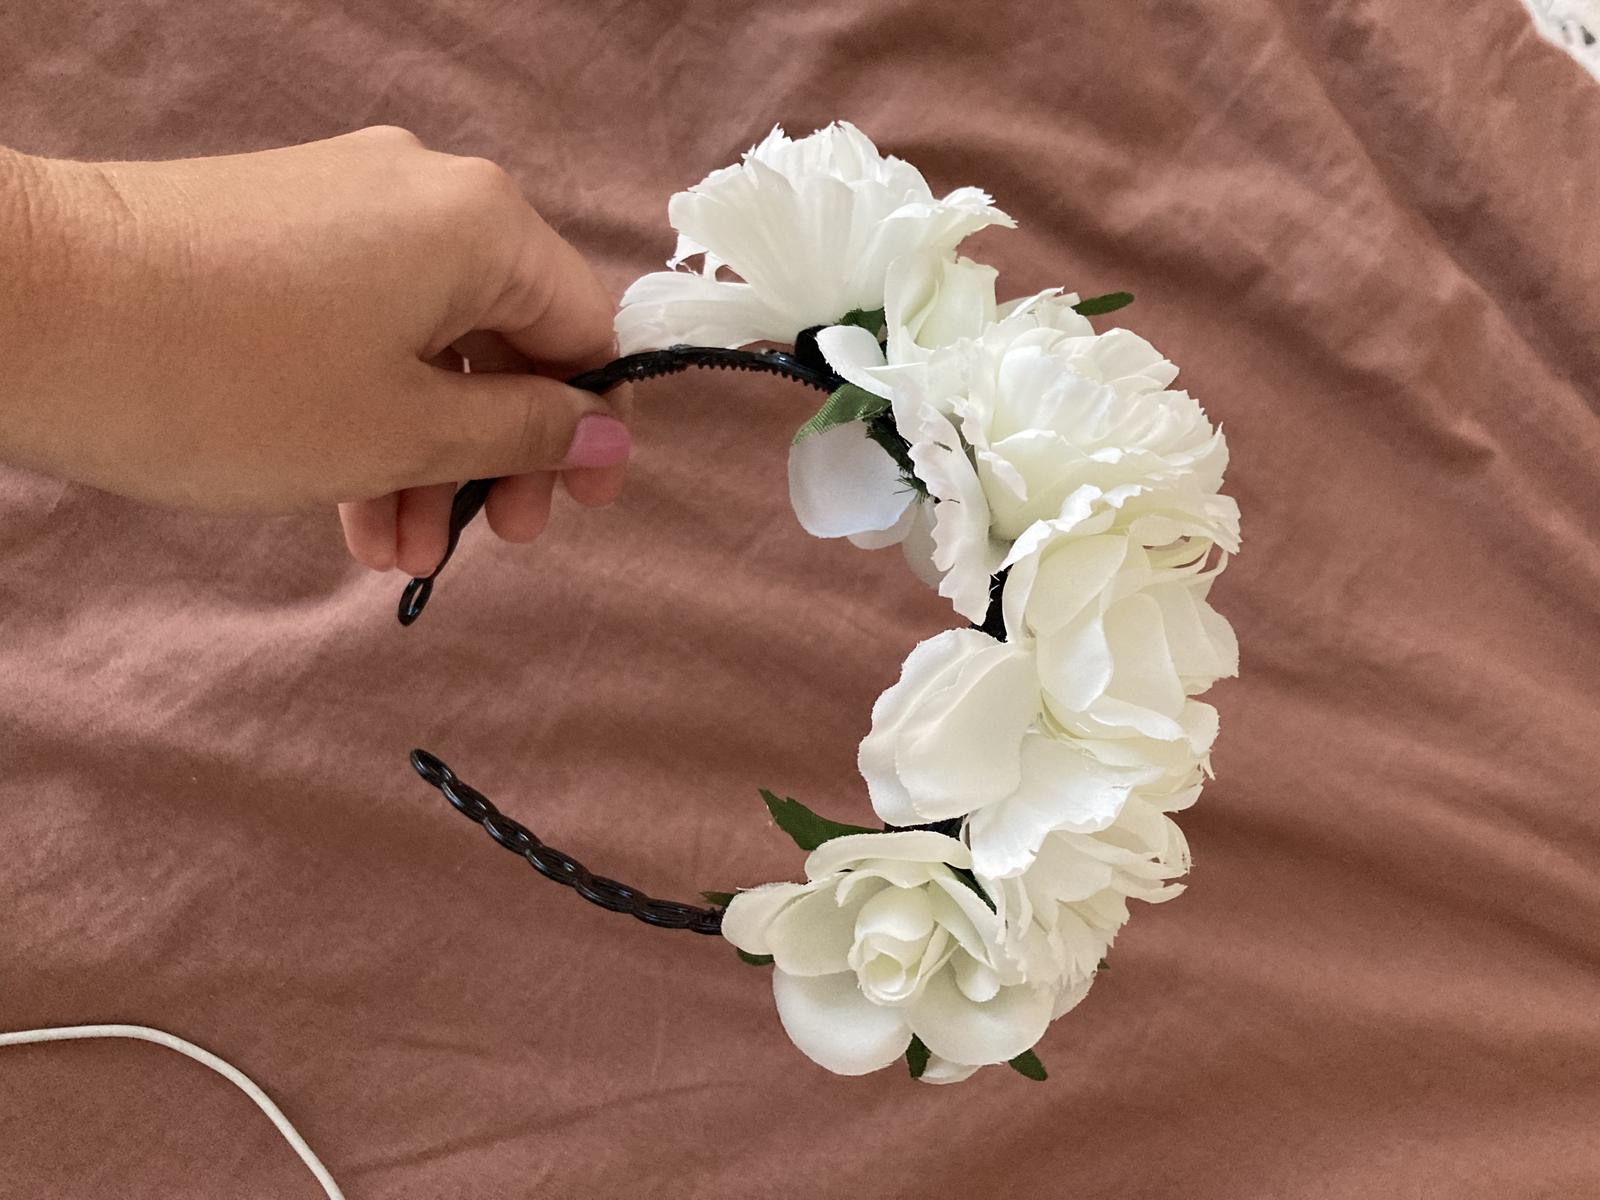 Celenka s bielymi kvetmi - Obrázok č. 1